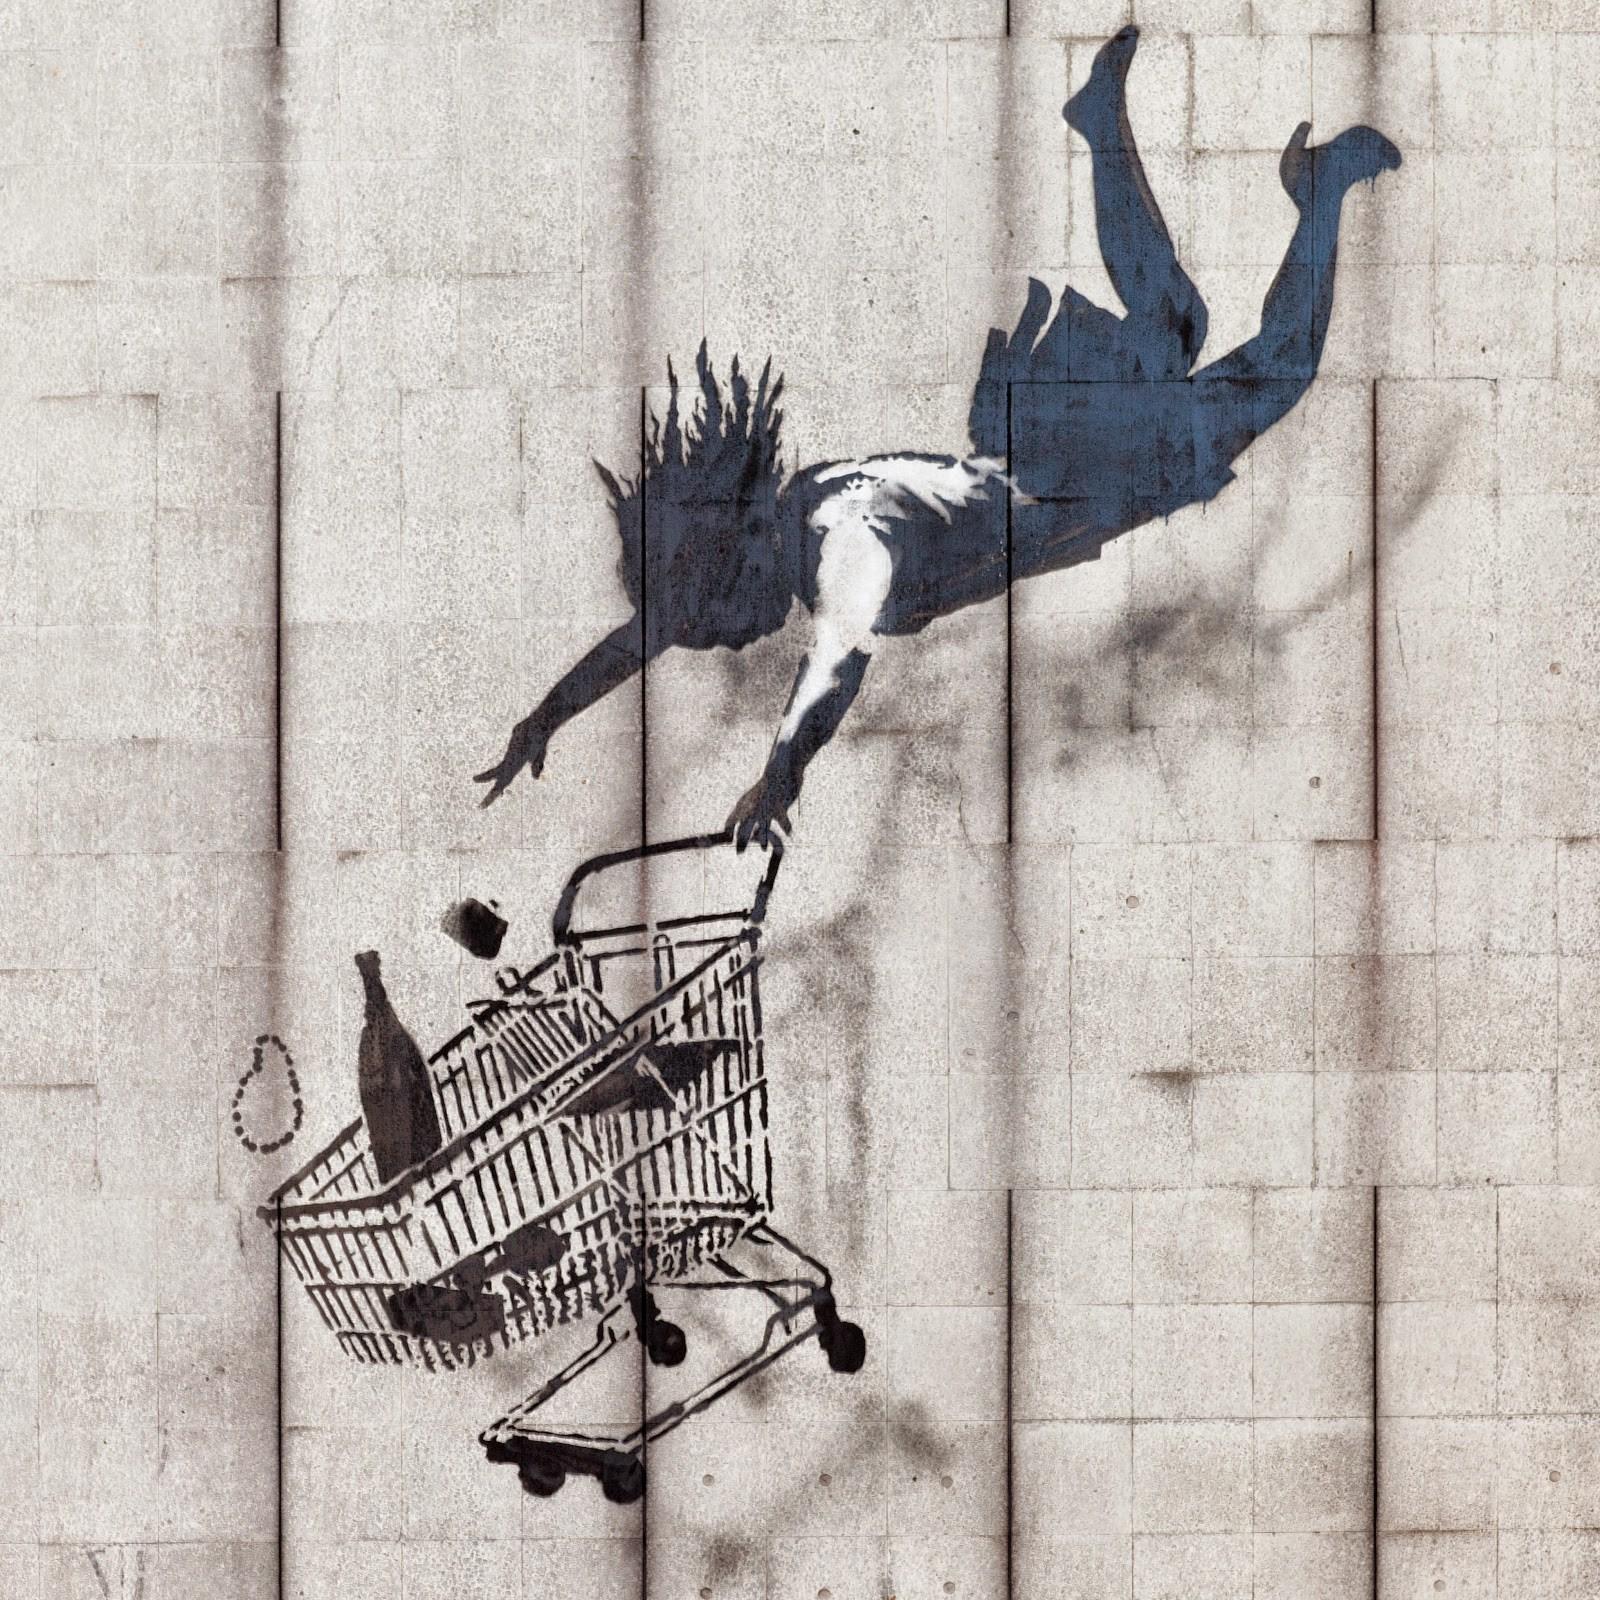 Banksy, Shop Until You Drop, Mayfair, London